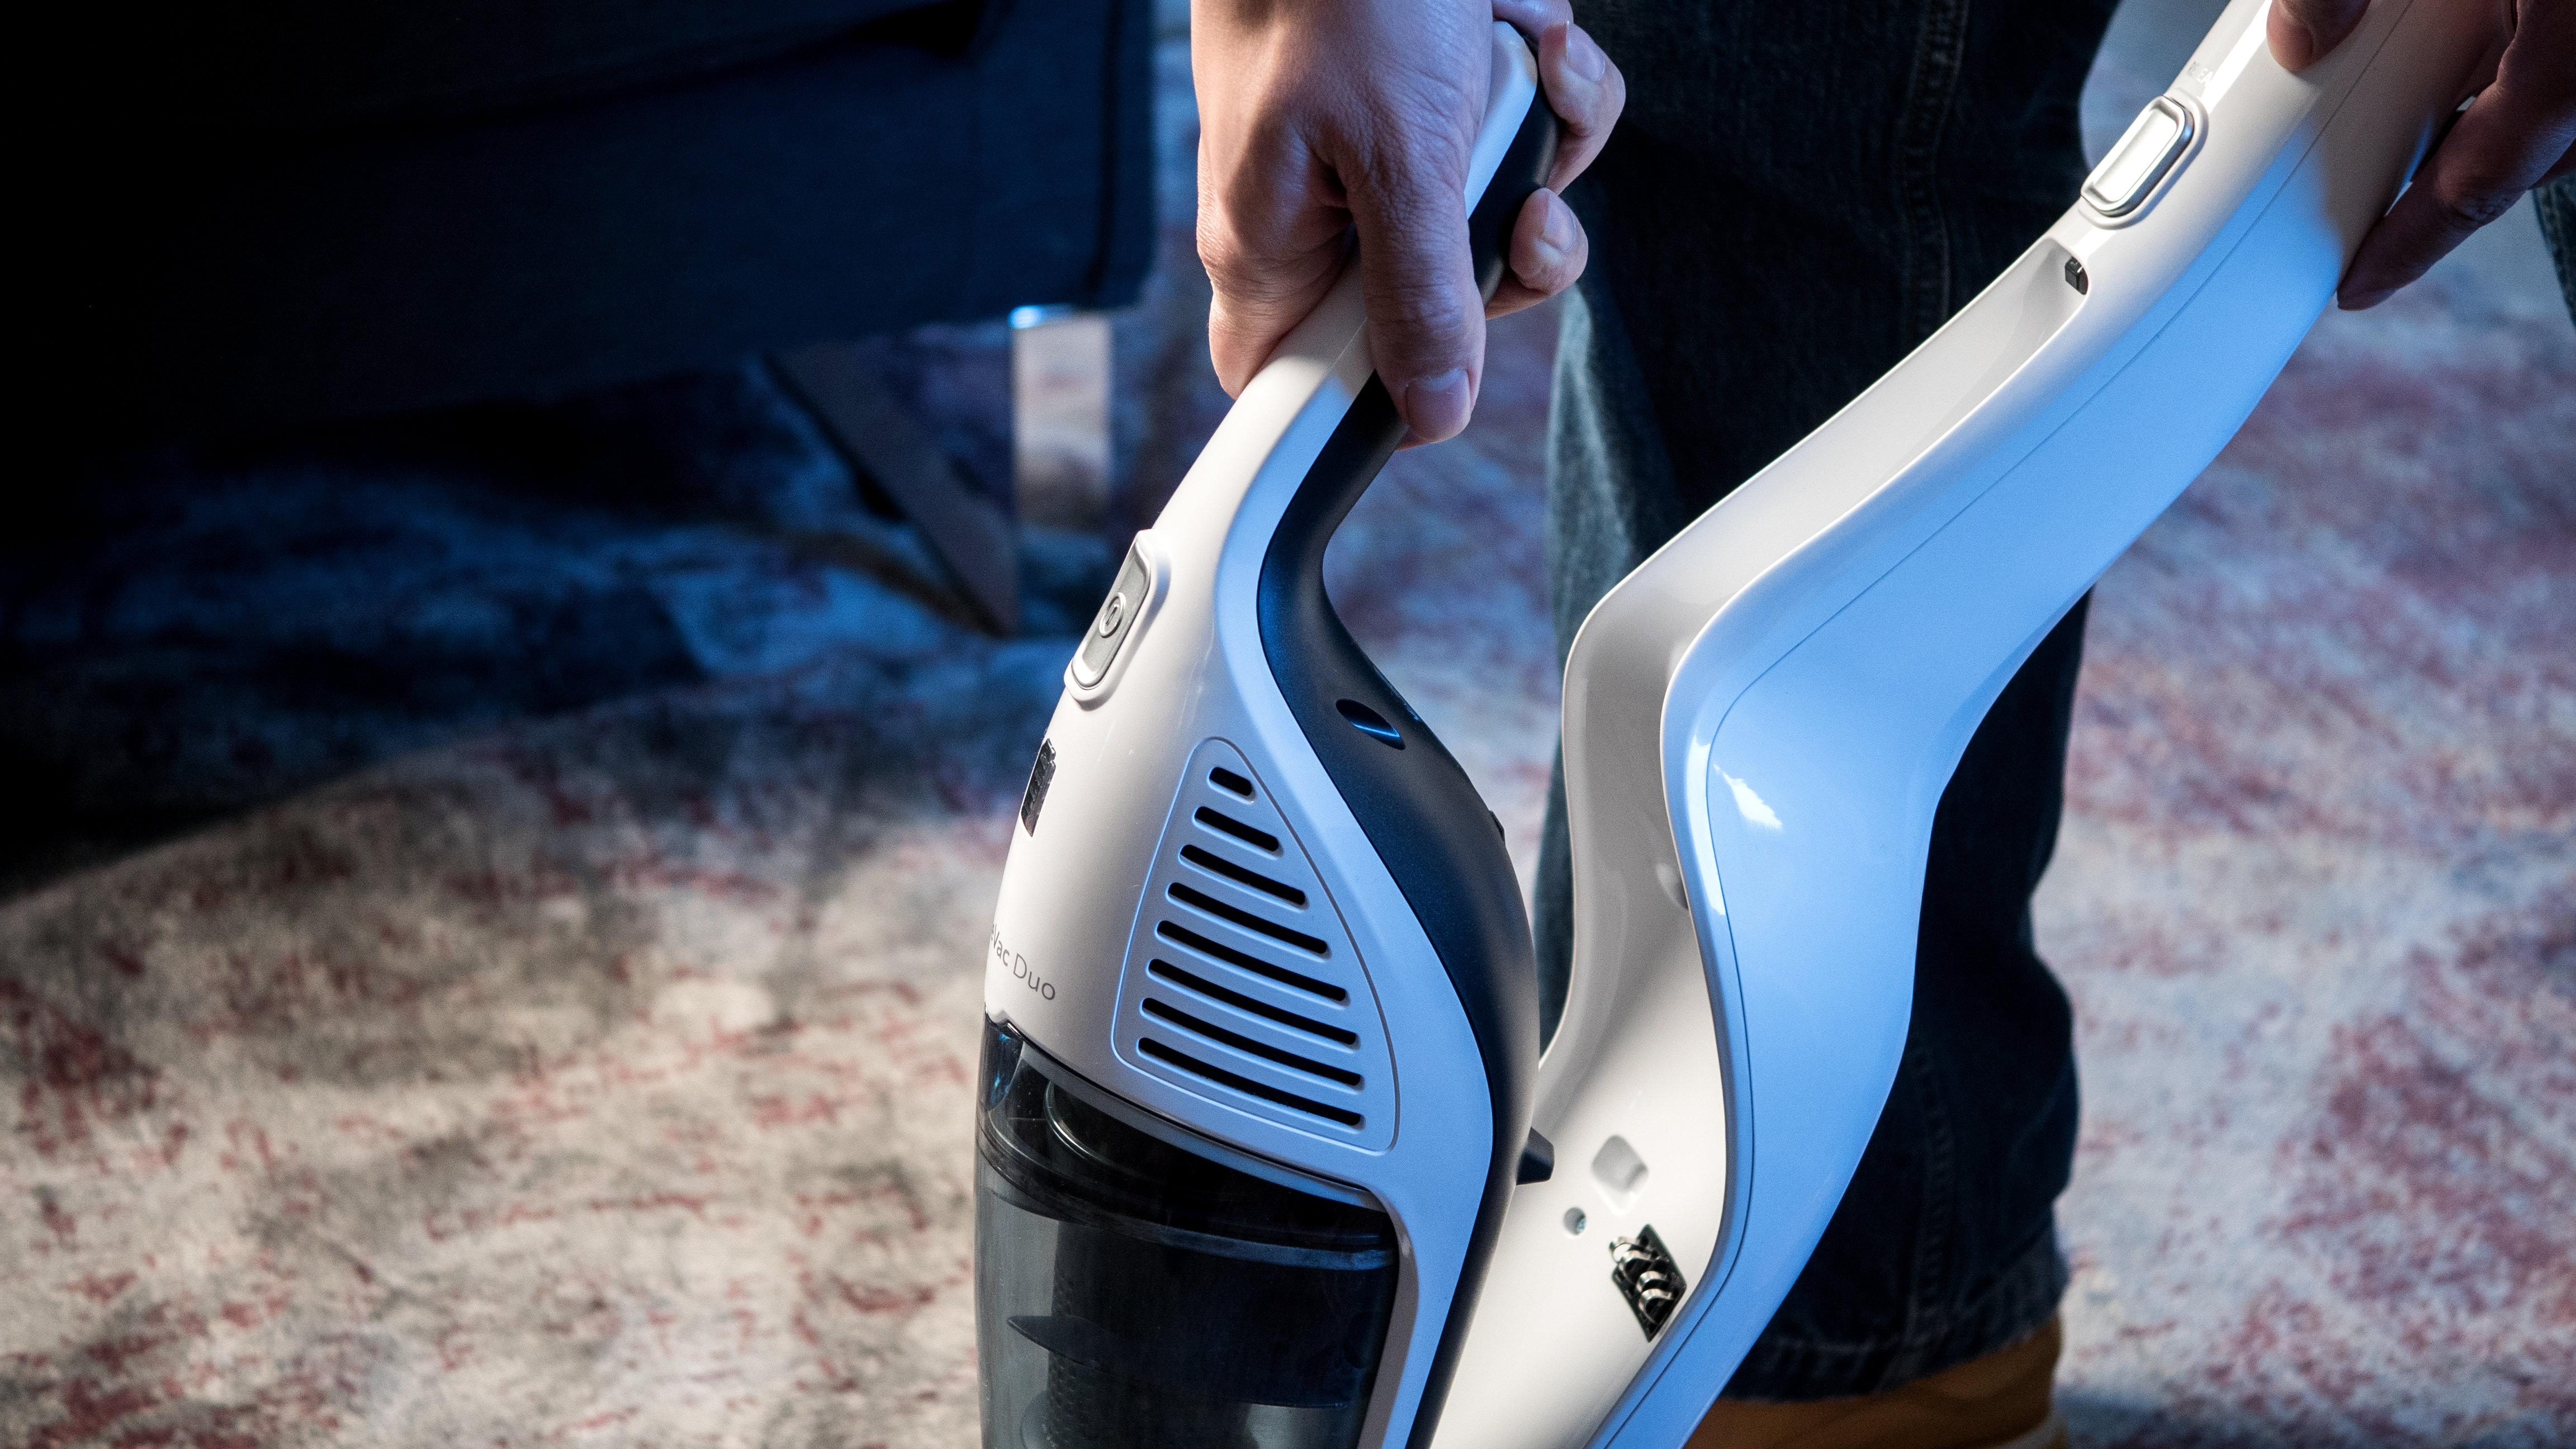 Eufy HomeVac Vacuum Cleaner